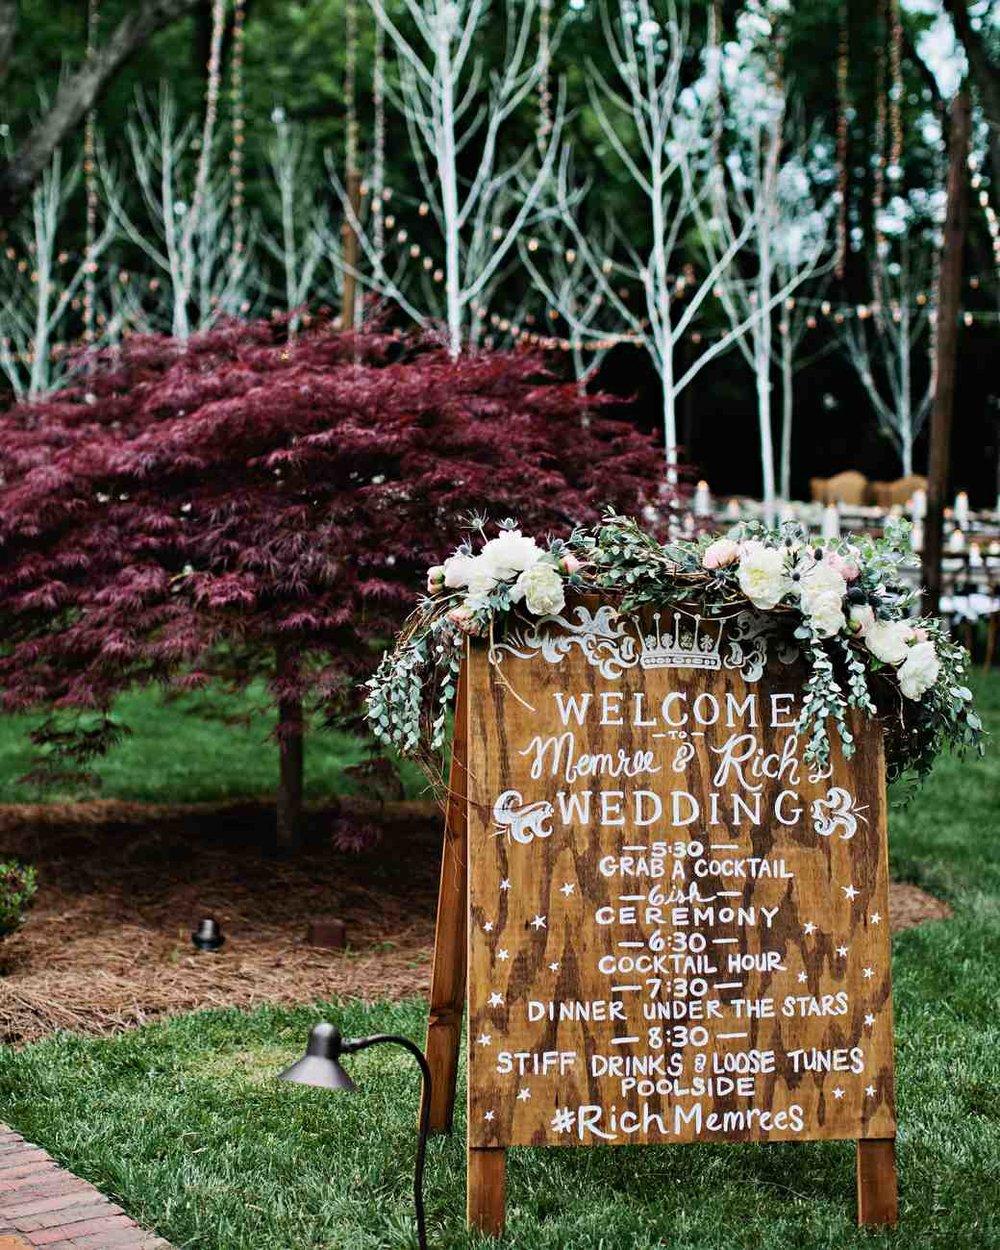 memree-rich-wedding-signage-140-6257086-0217_vert.jpg